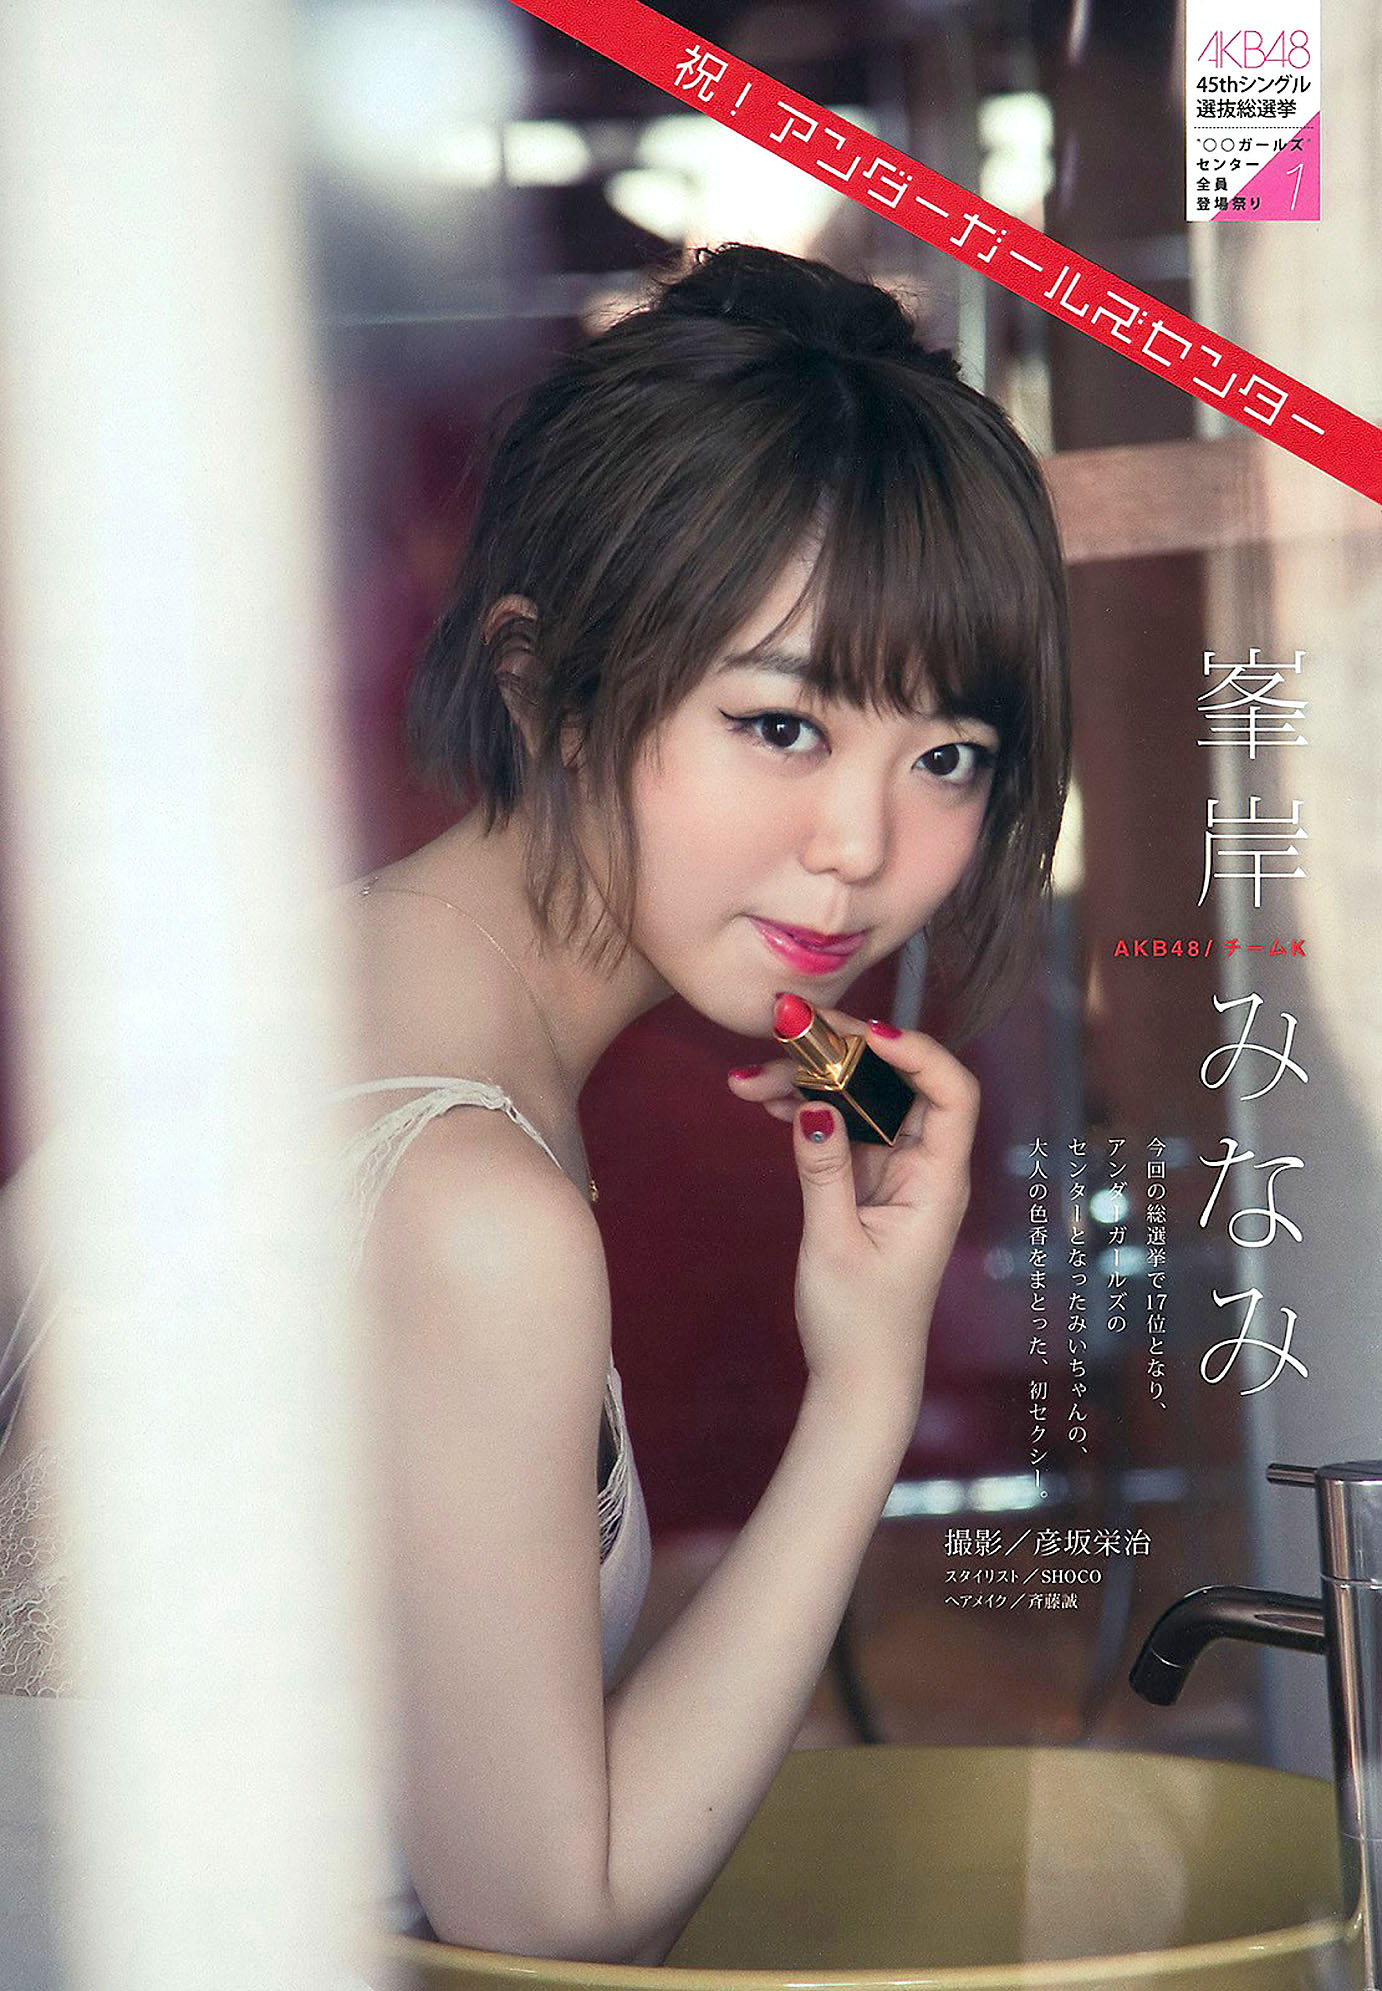 MMinegishi Young Magazine 160822 01.jpg